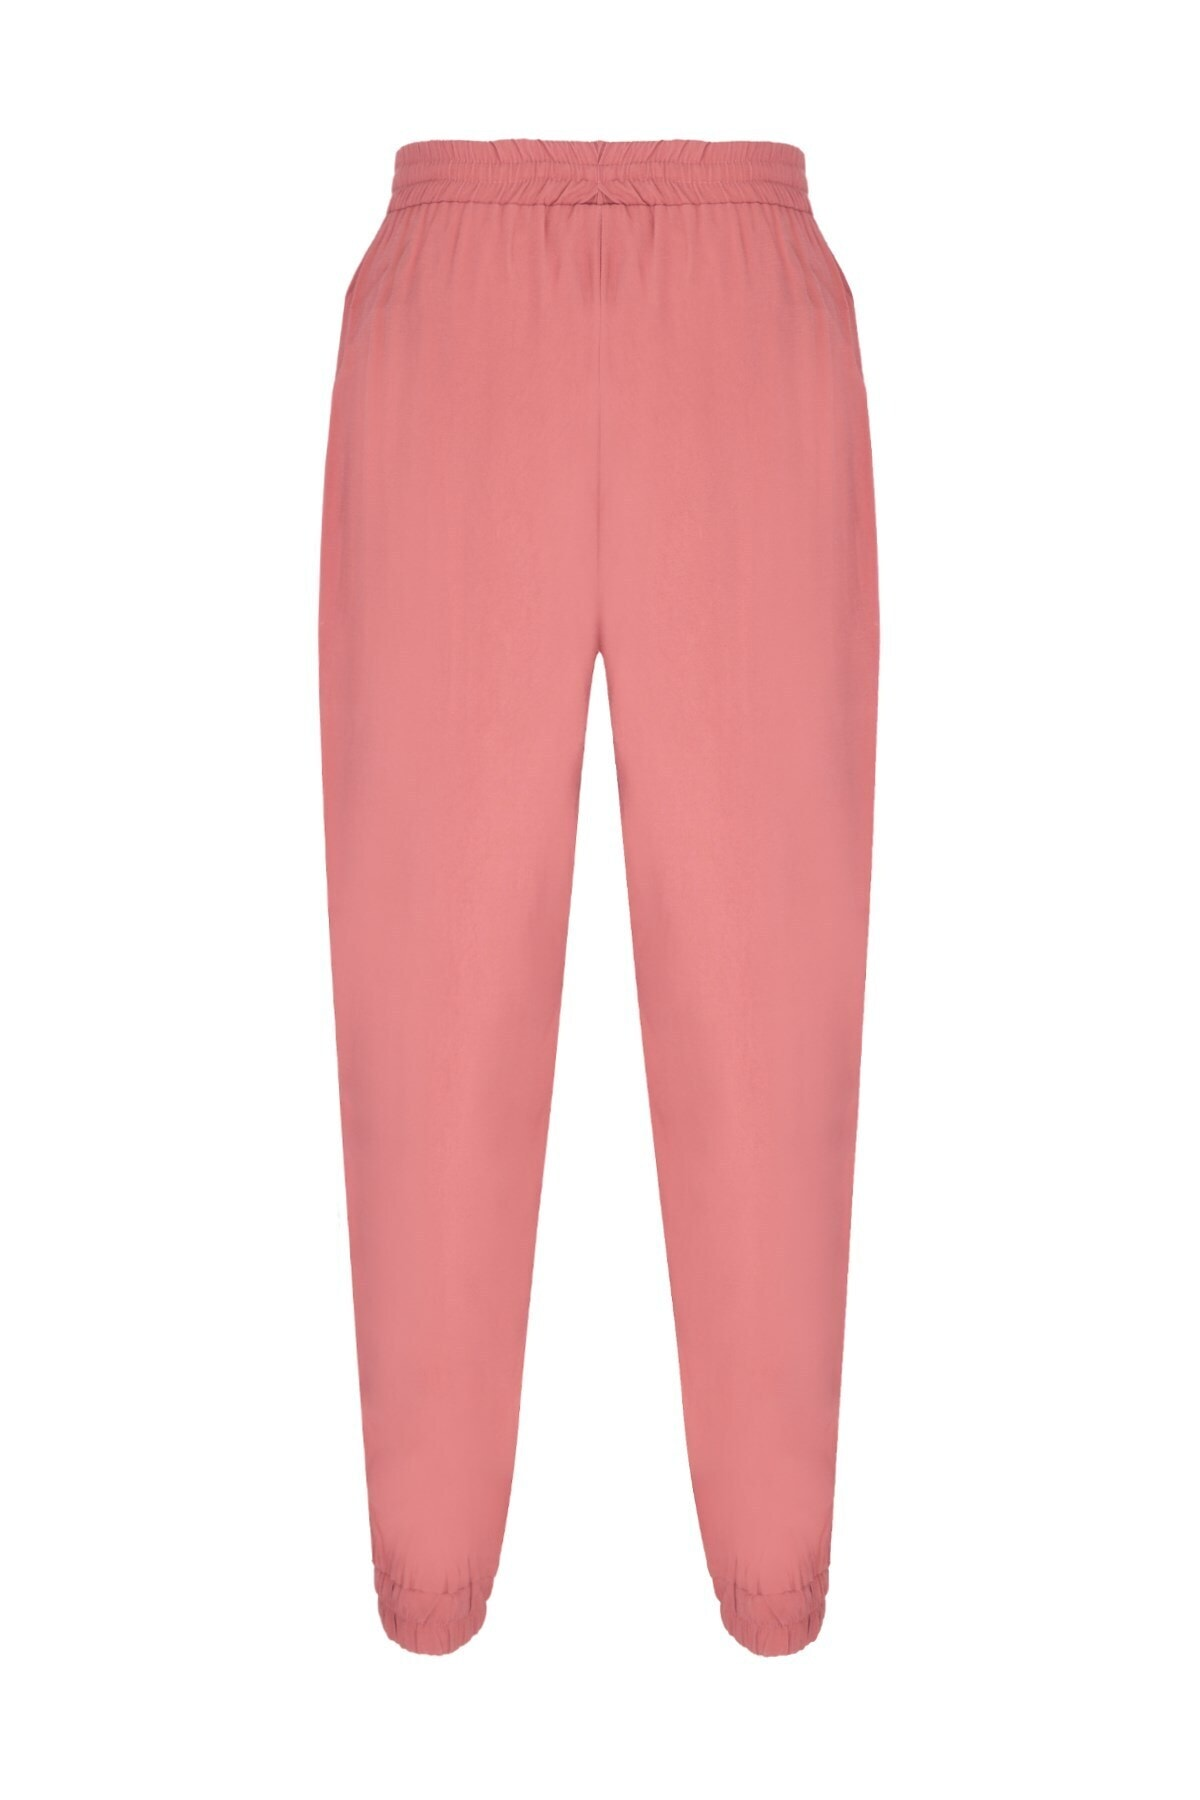 Oblavion Kadın Gülkurusu Beli Lastikli Pantolon 2